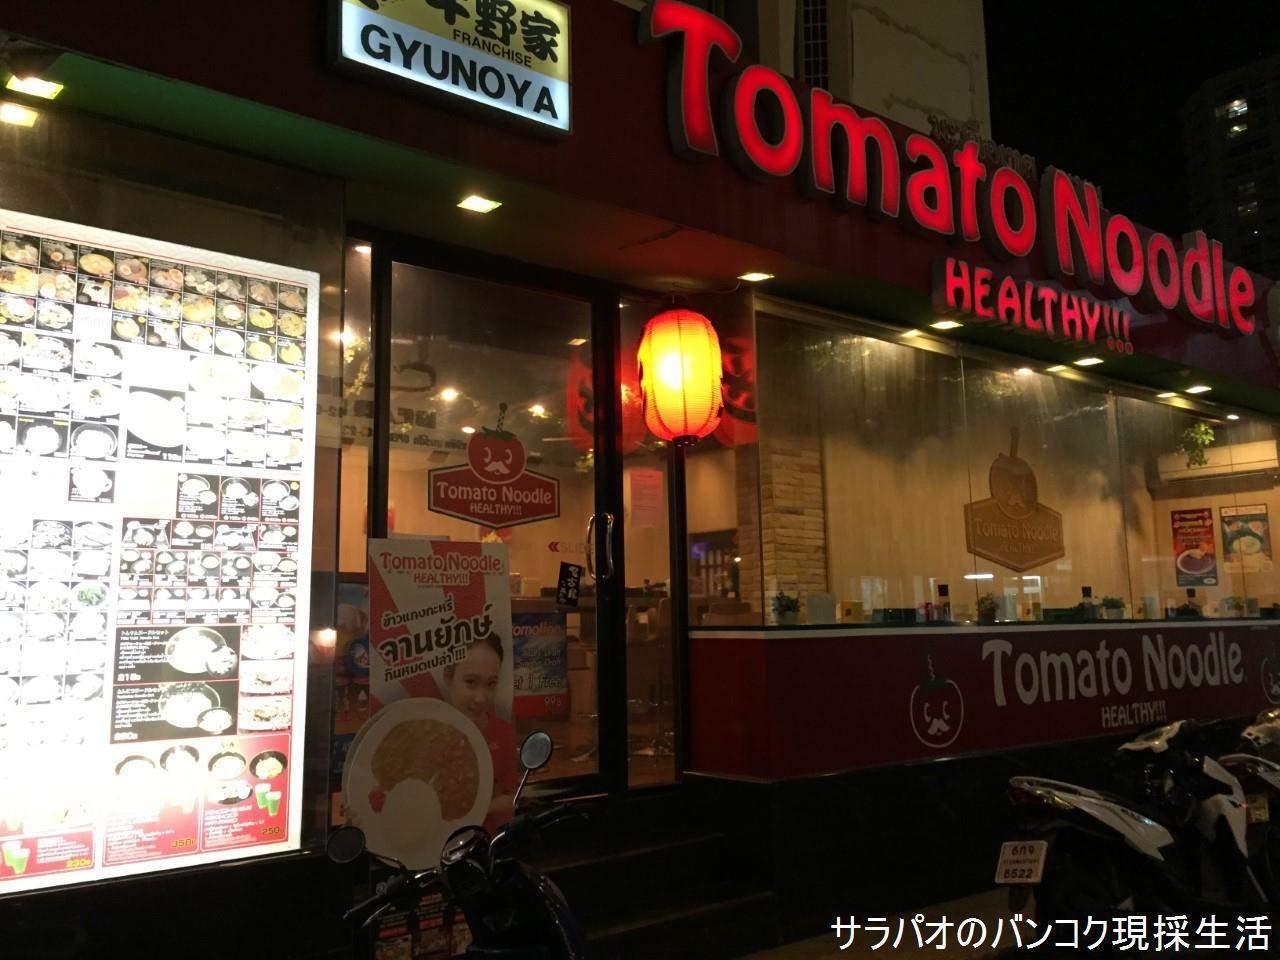 TomatoNoodleSukhumvit33_01.jpg